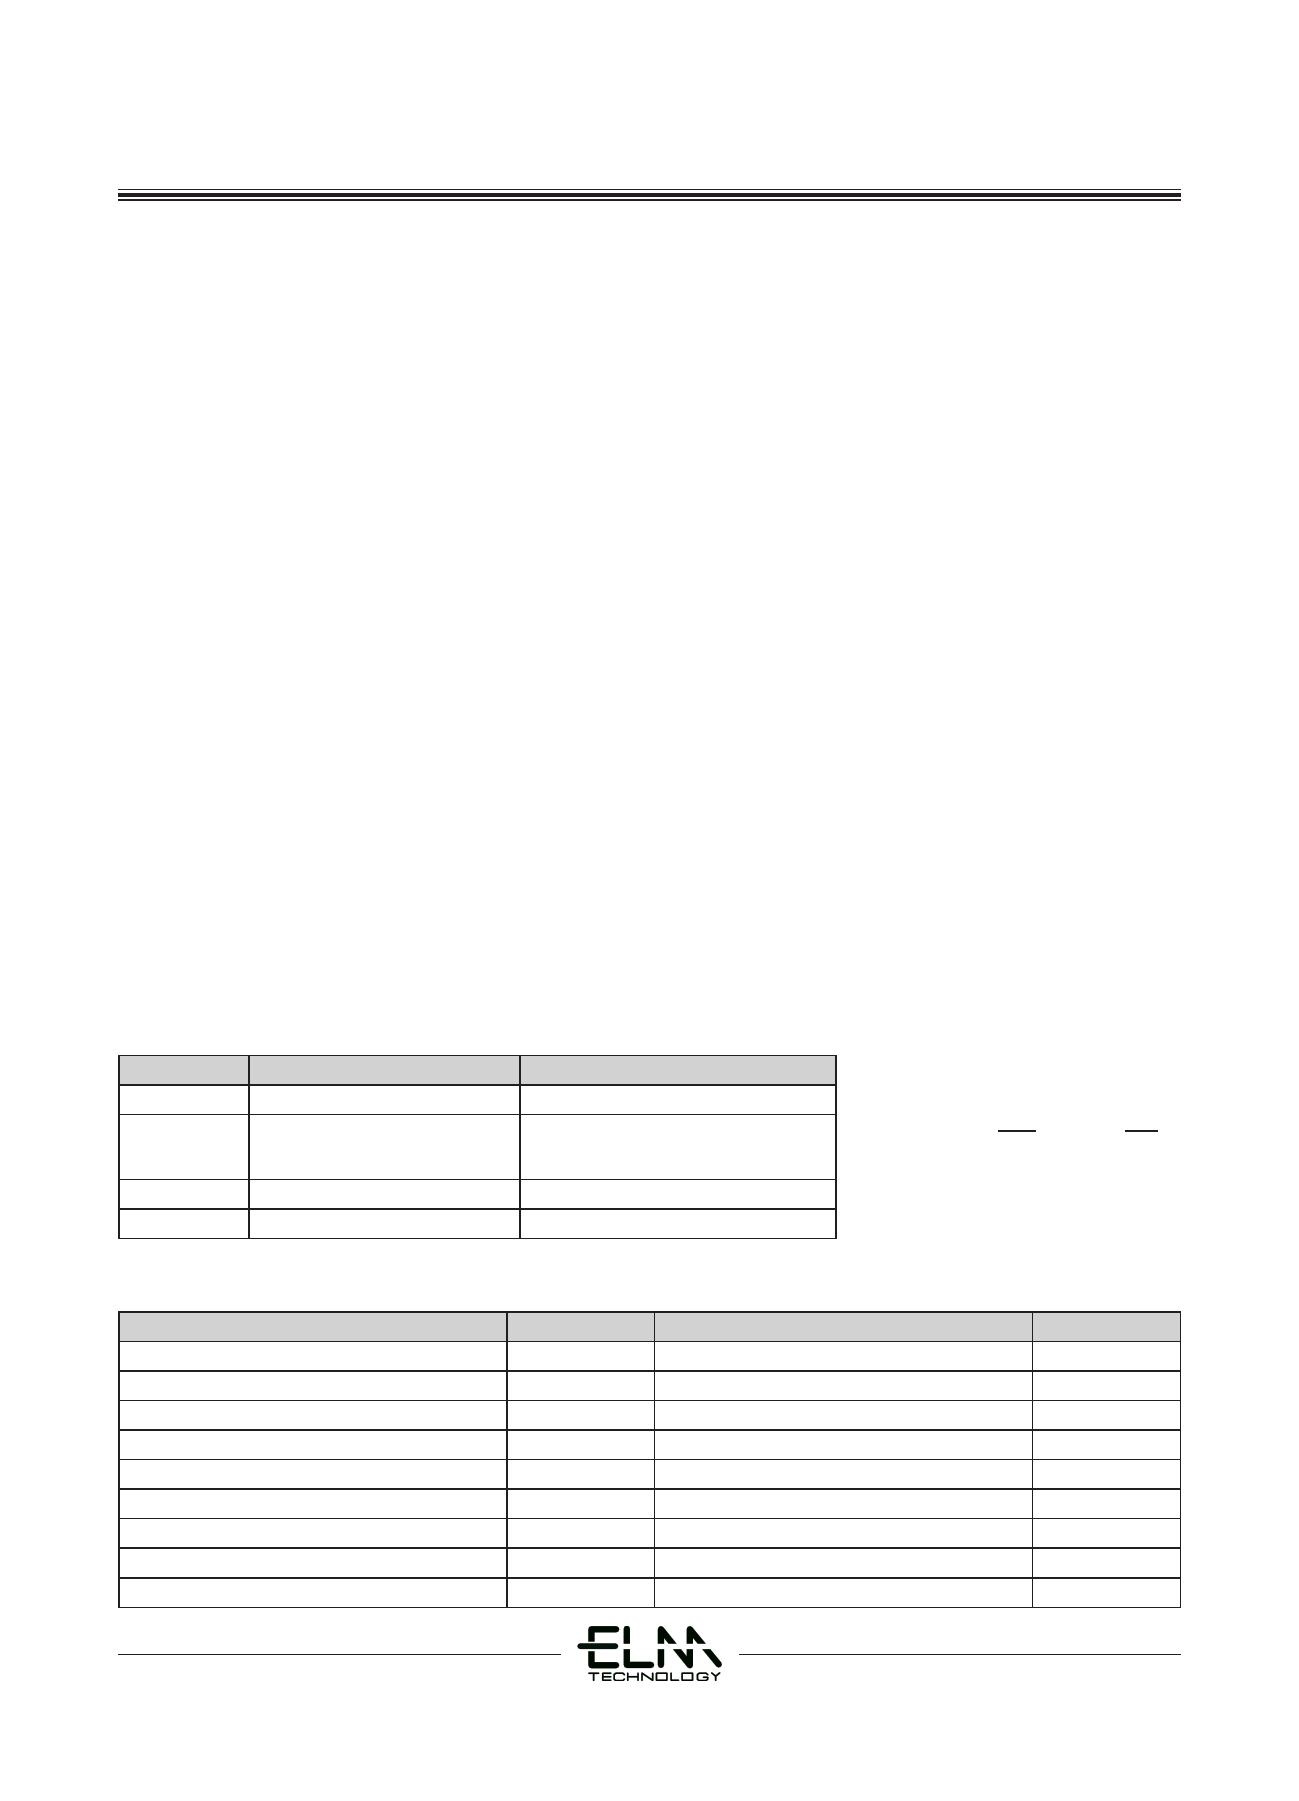 ELM7SH126MA Datasheet, ELM7SH126MA PDF,ピン配置, 機能